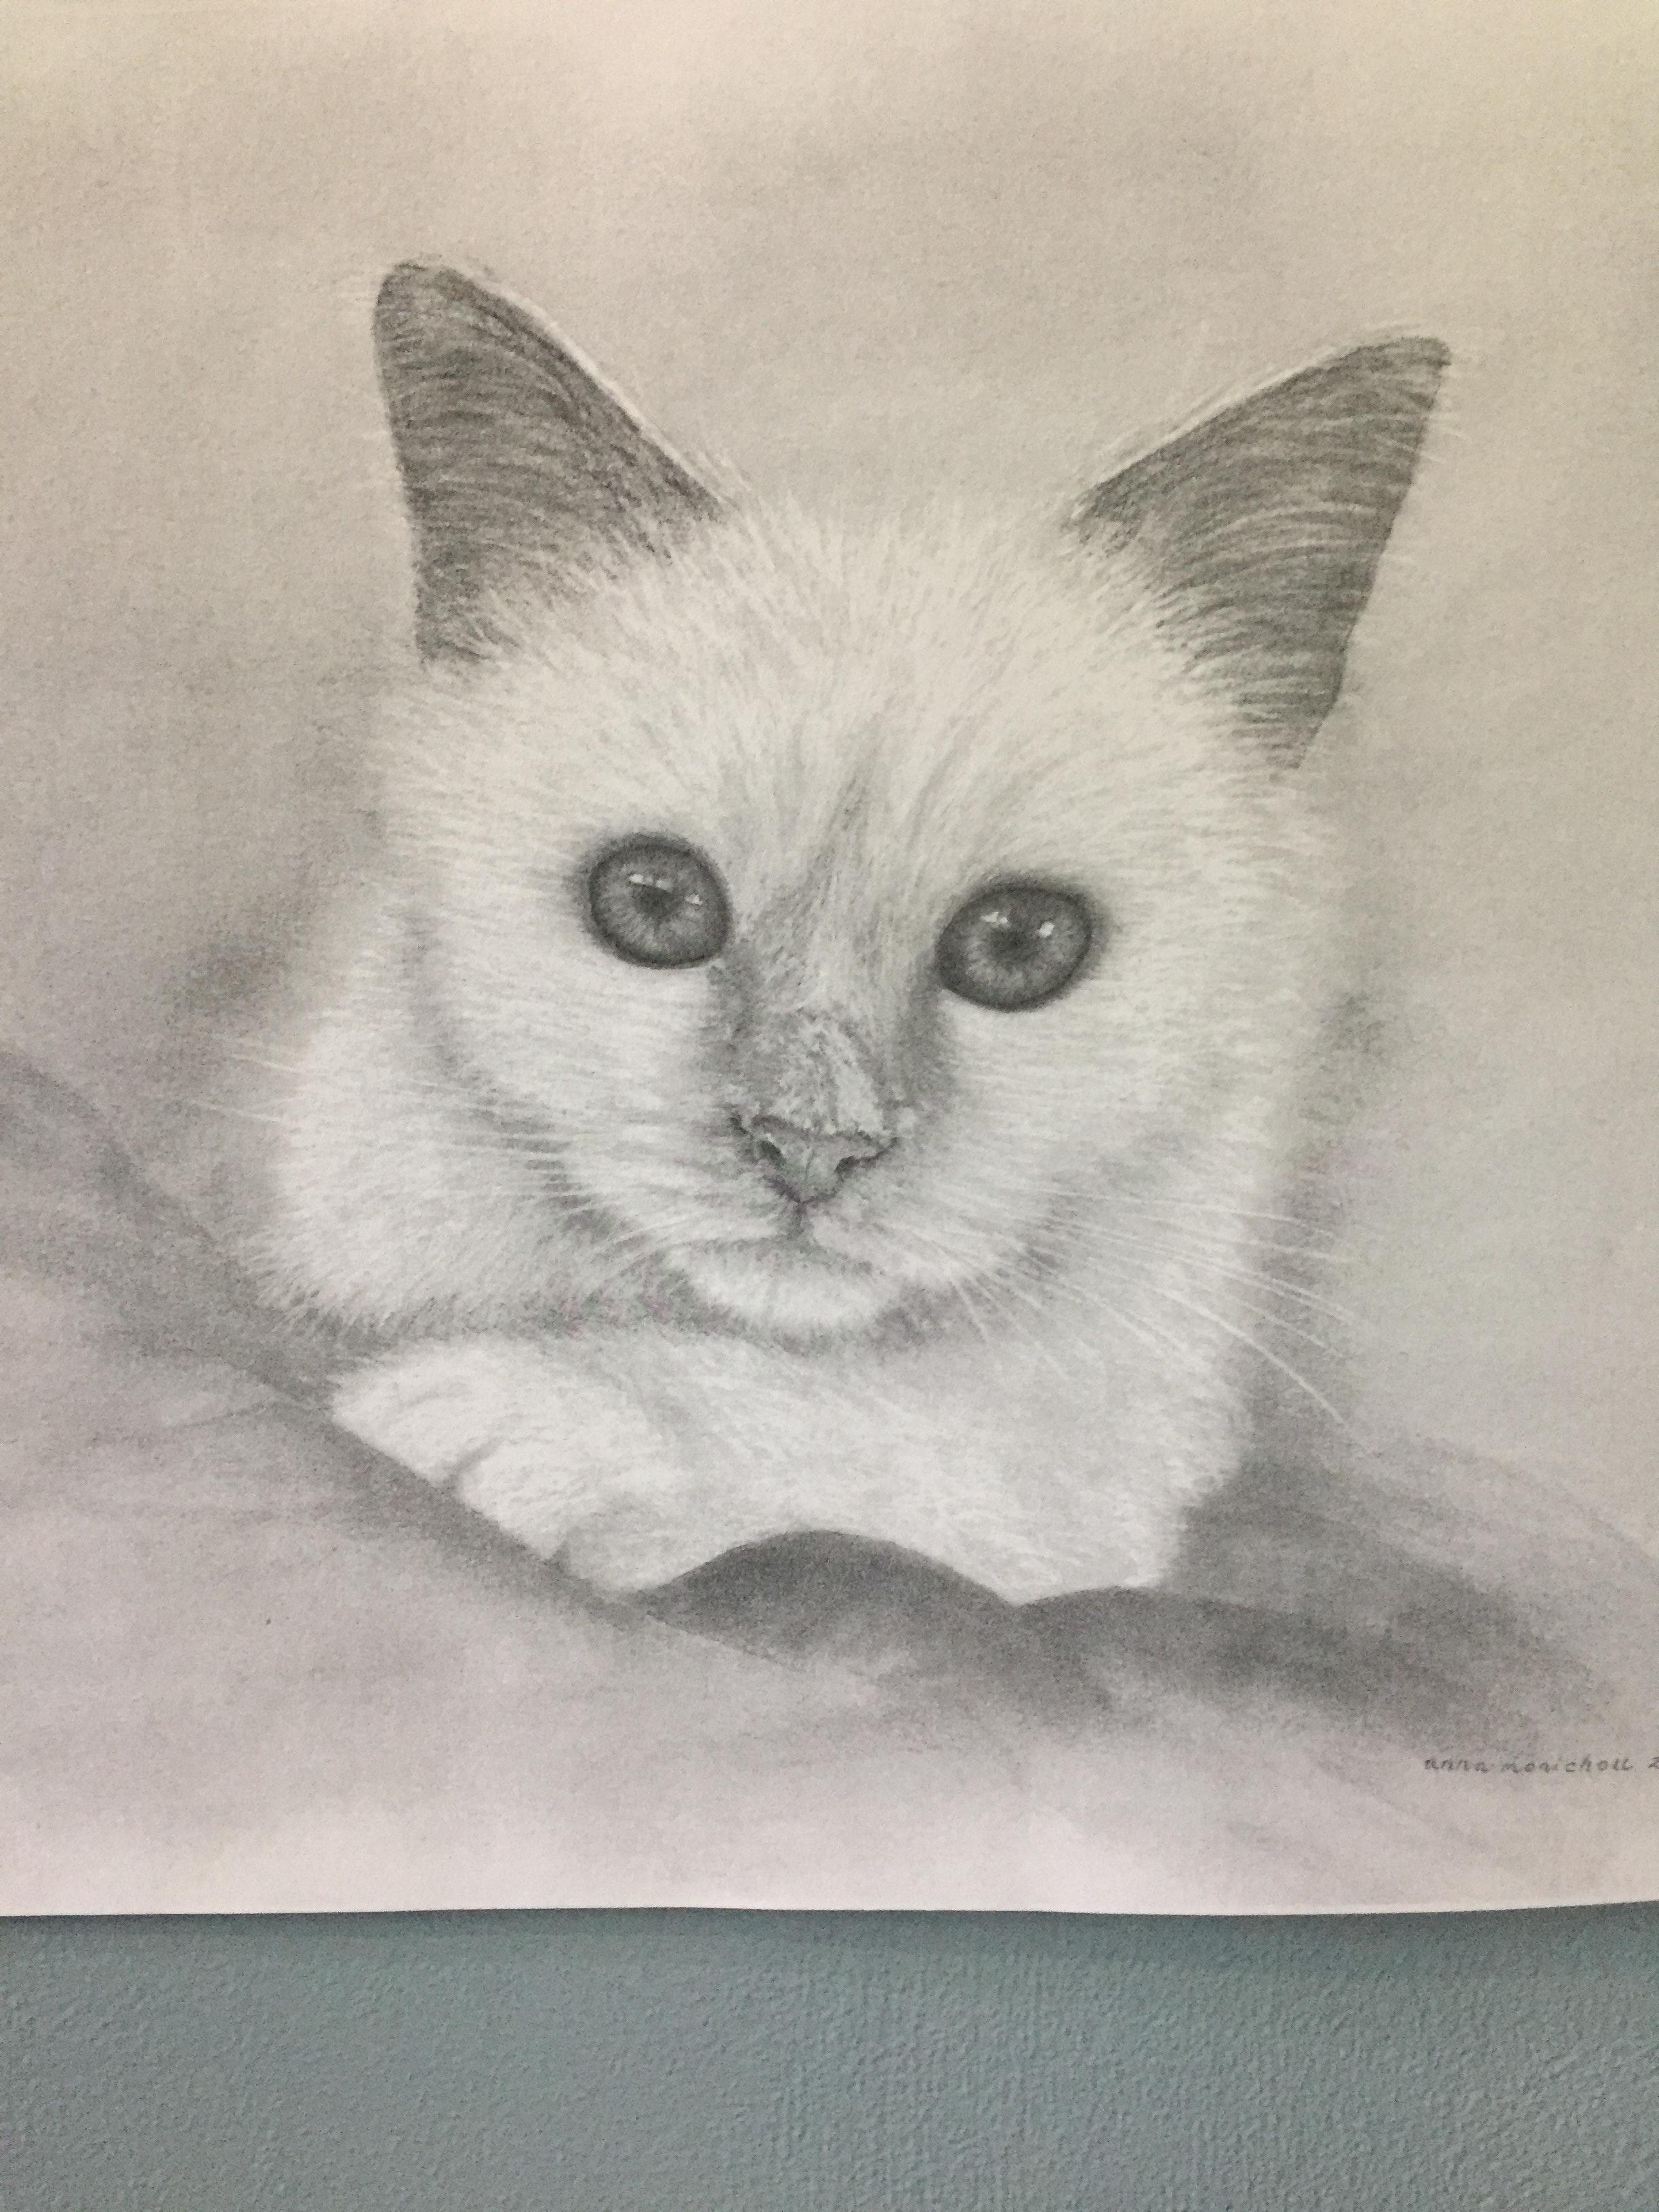 Unduh 63+  Gambar Kucing Dengan Pensil Paling Lucu HD